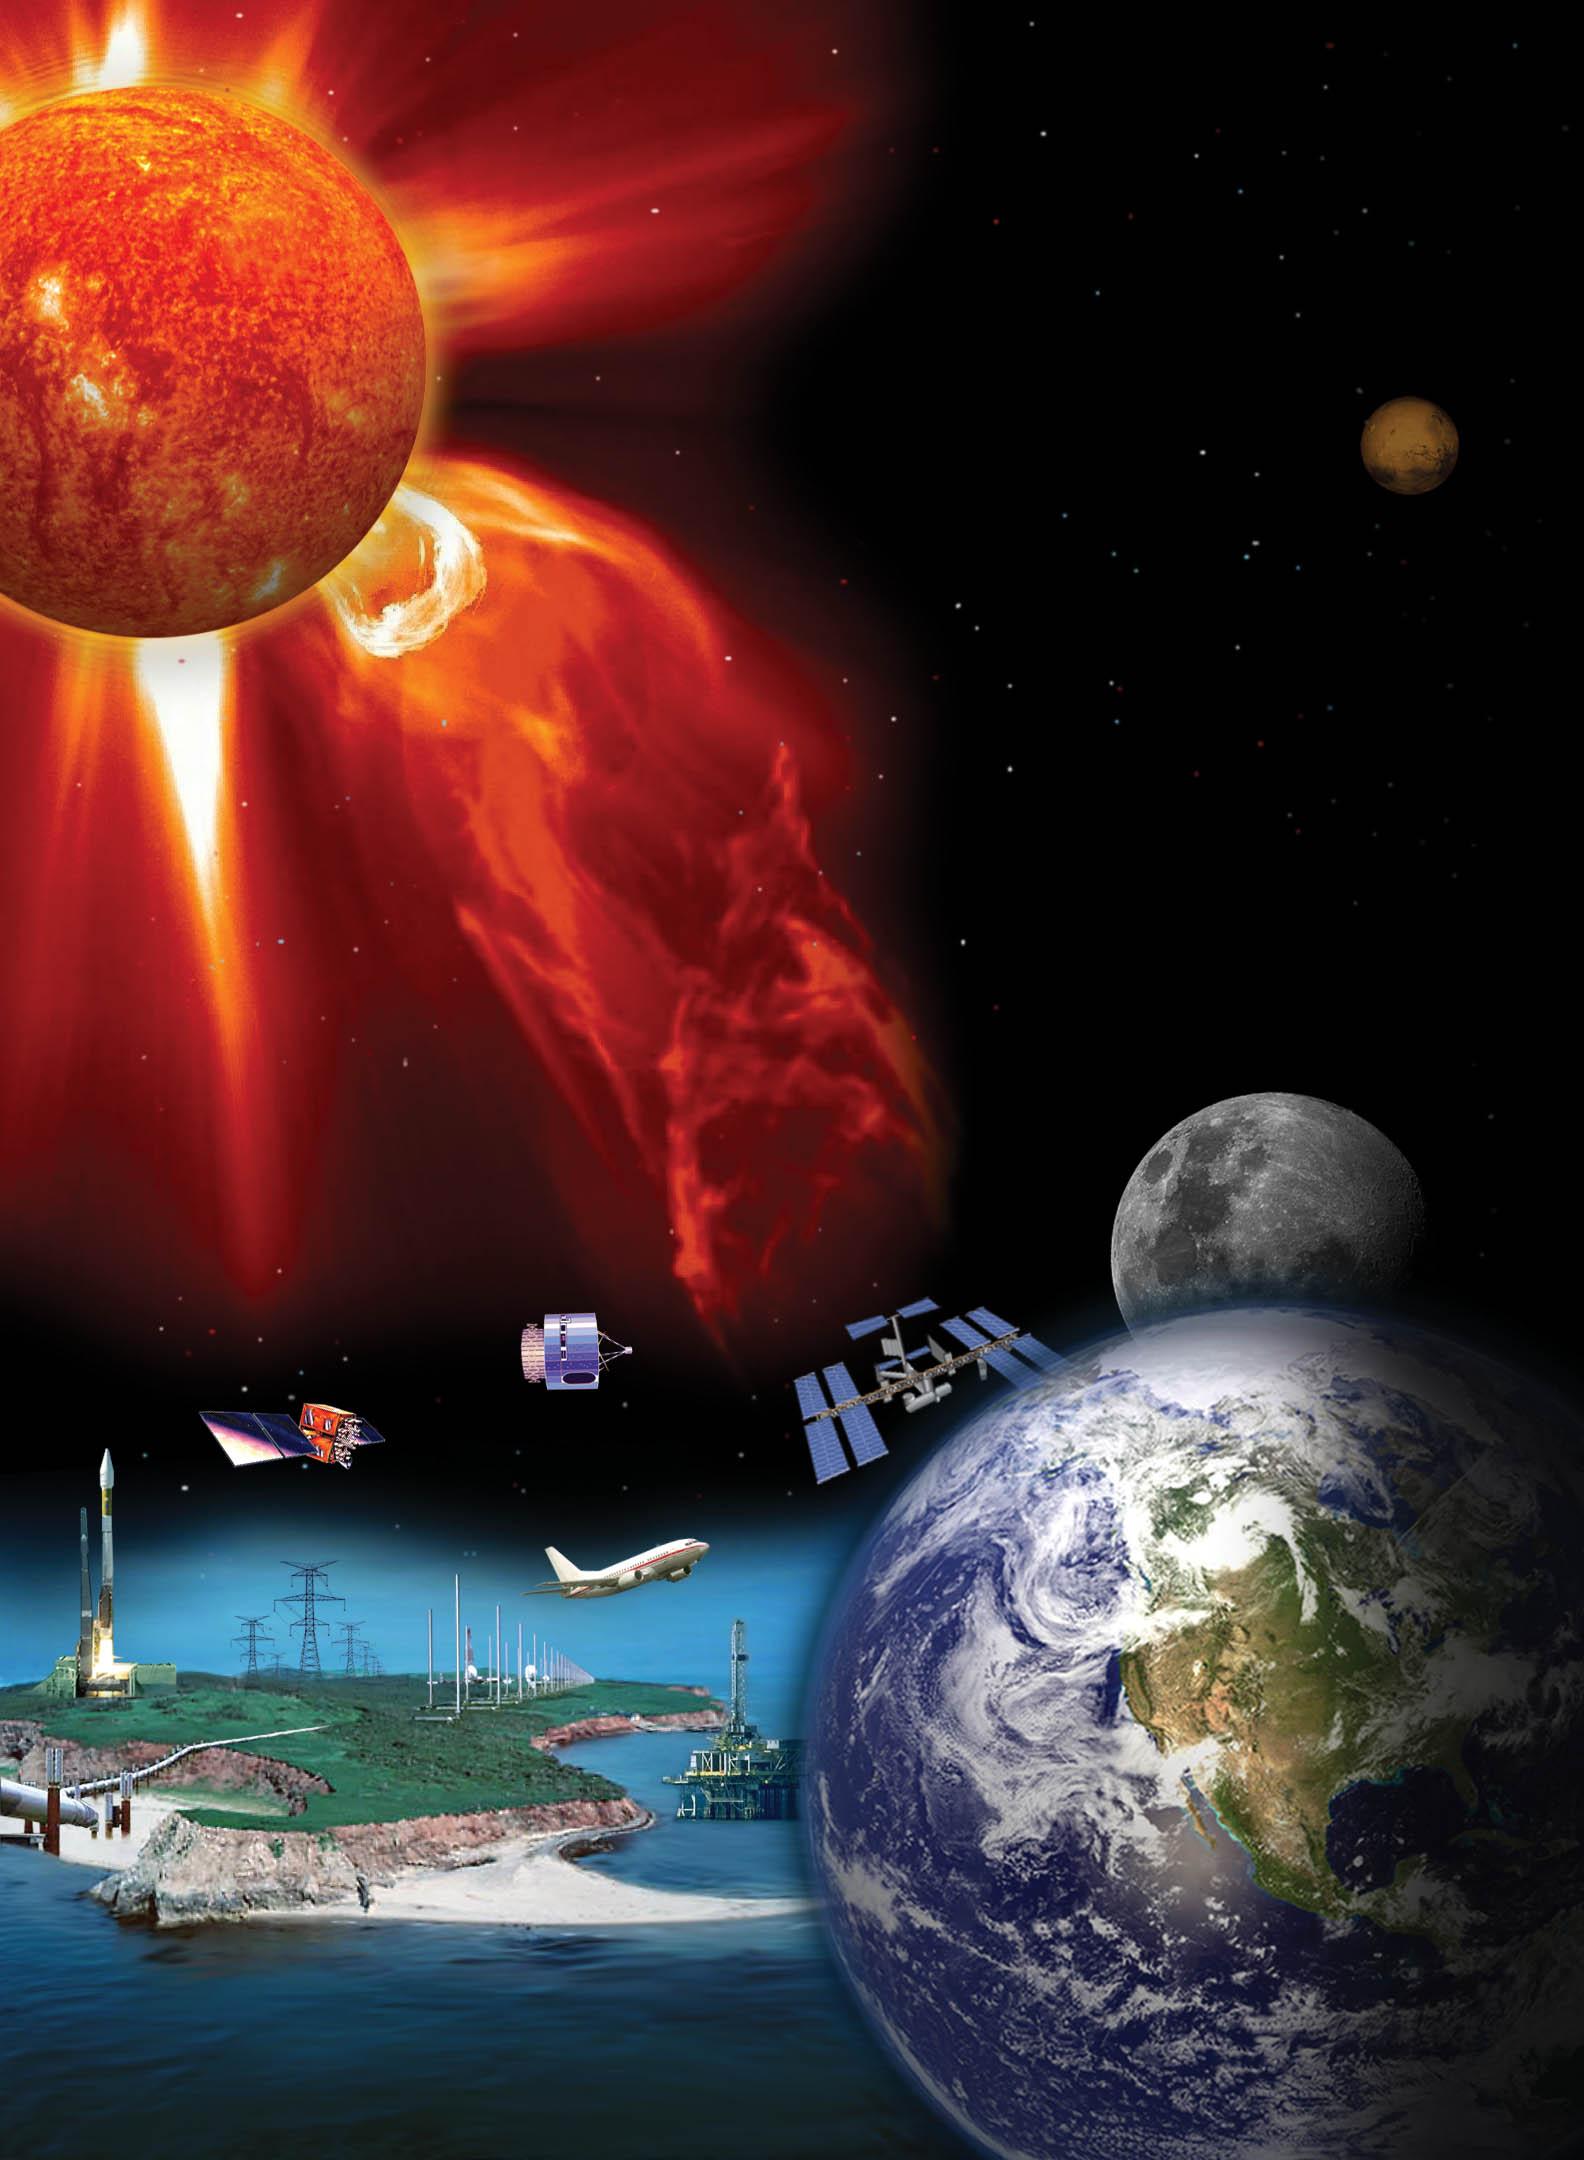 solar storm june 2019 effects - photo #39